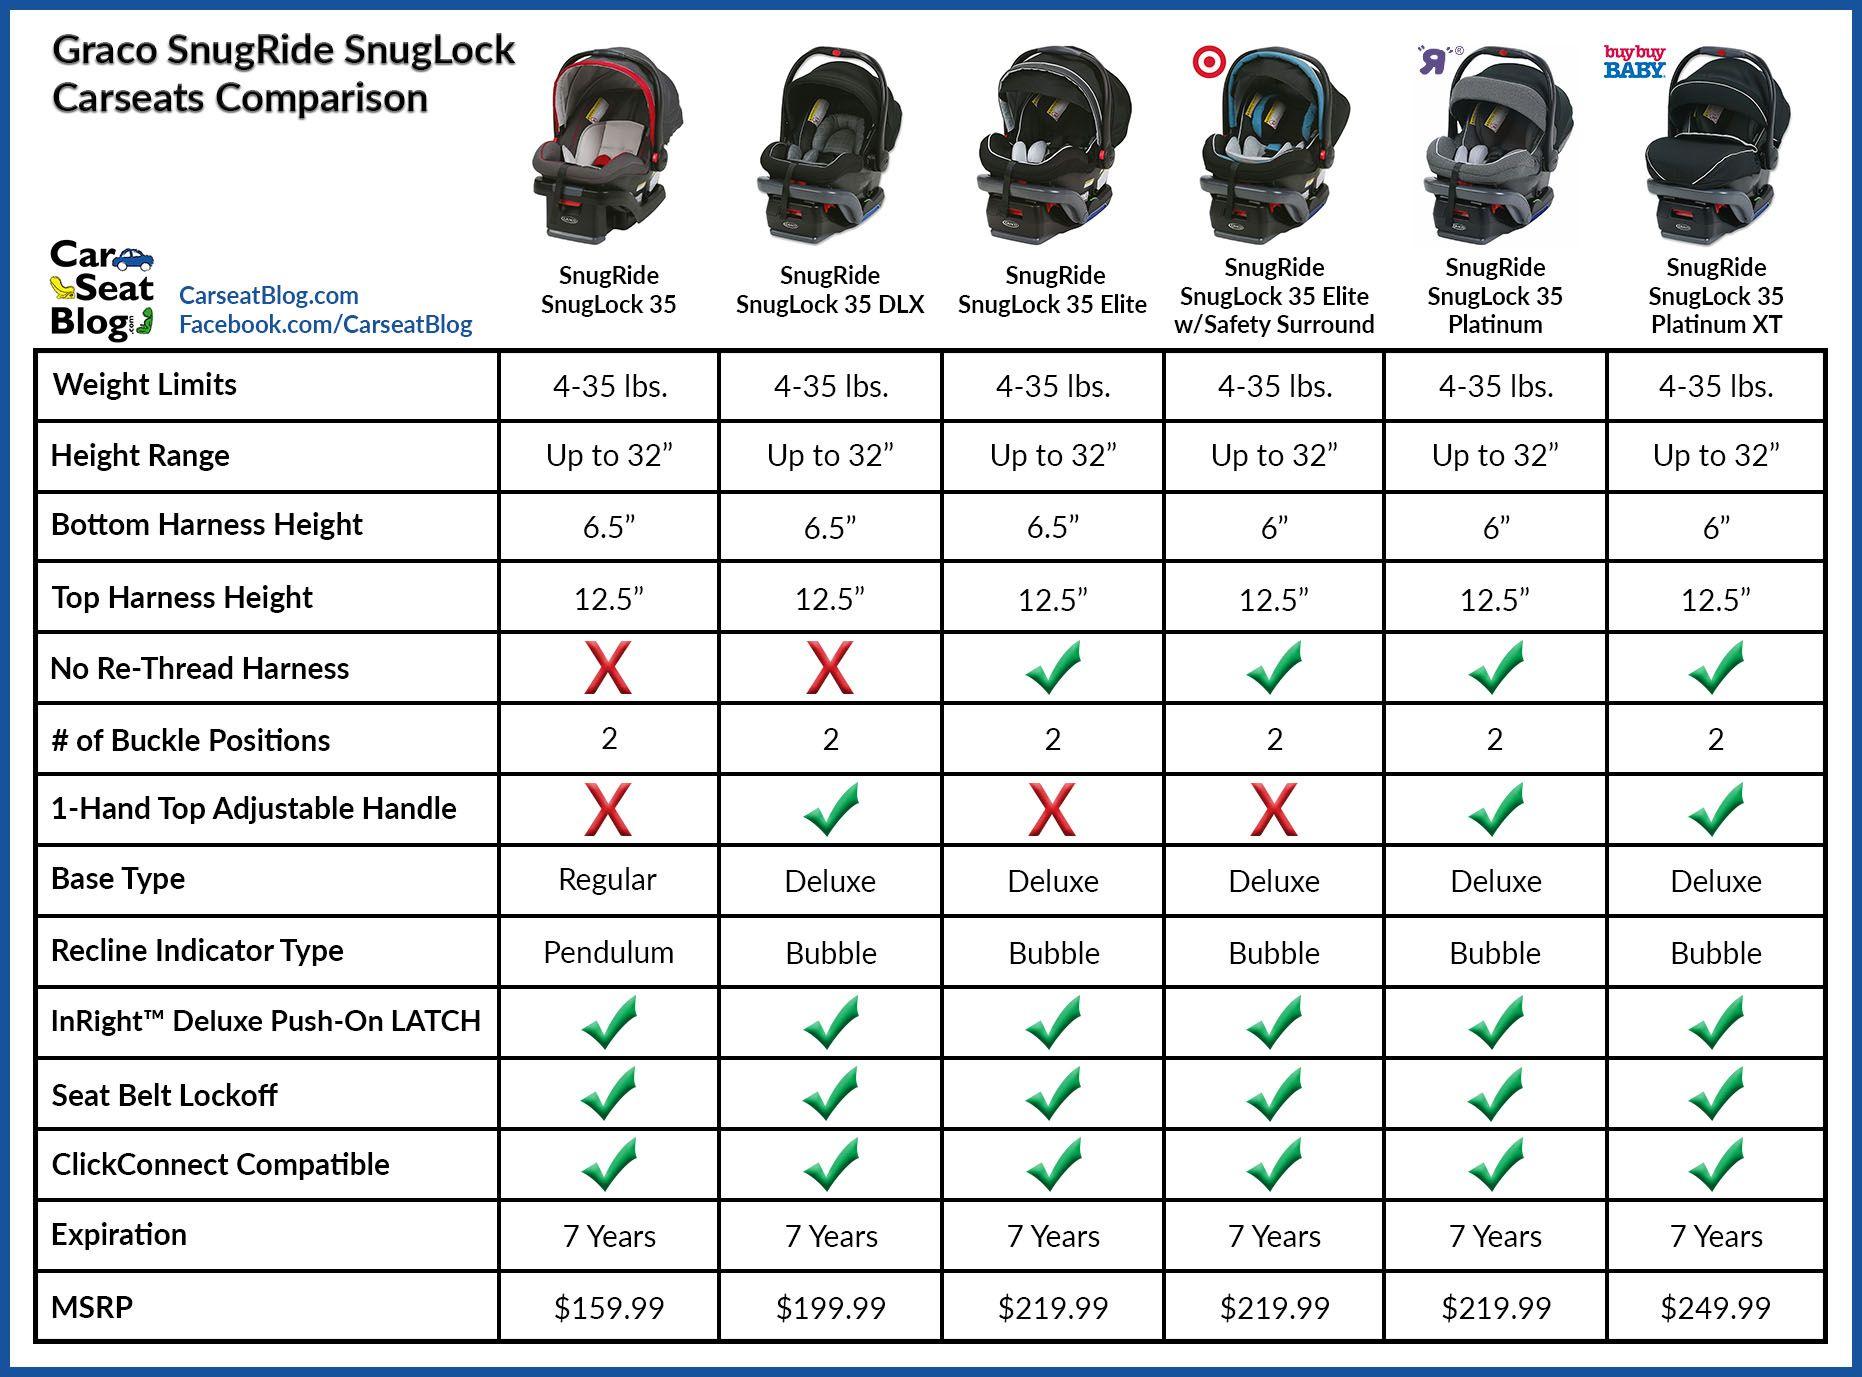 Graco snugride snuglock comparison baby car seats child safety charts kids also carseat rh pinterest